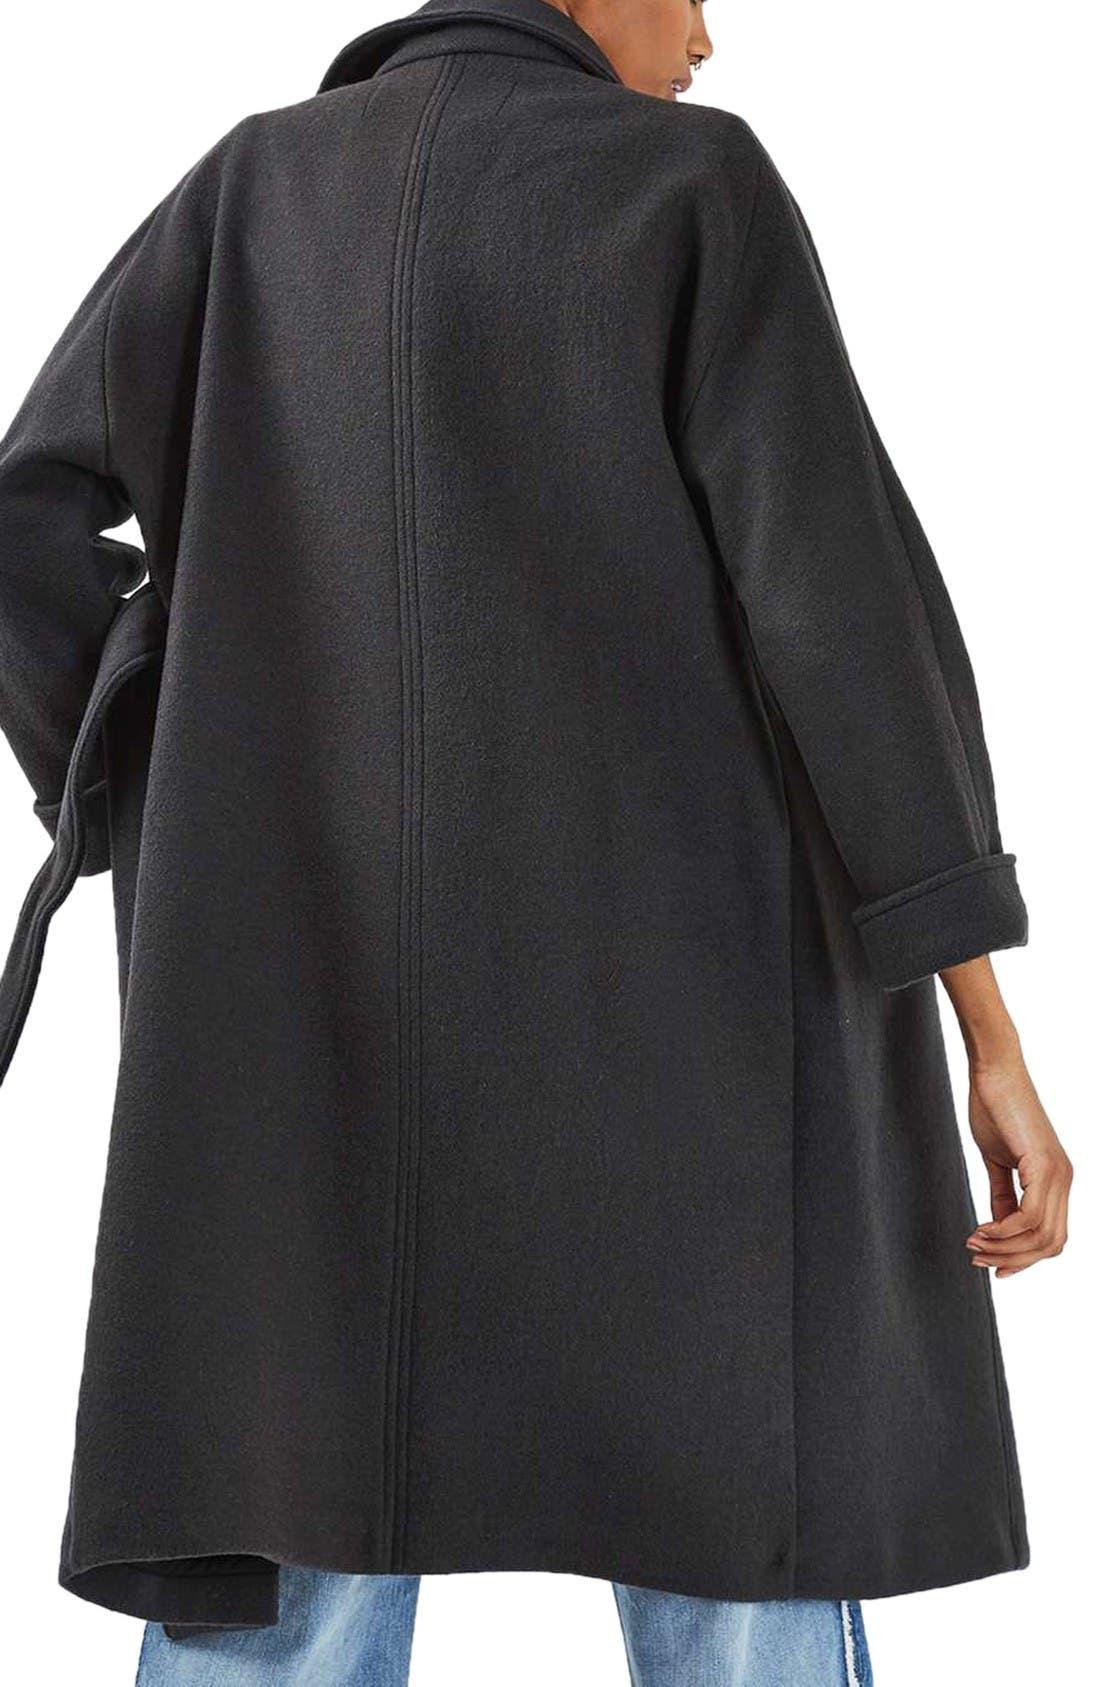 Alternate Image 3  - Topshop Wool Blend Coat